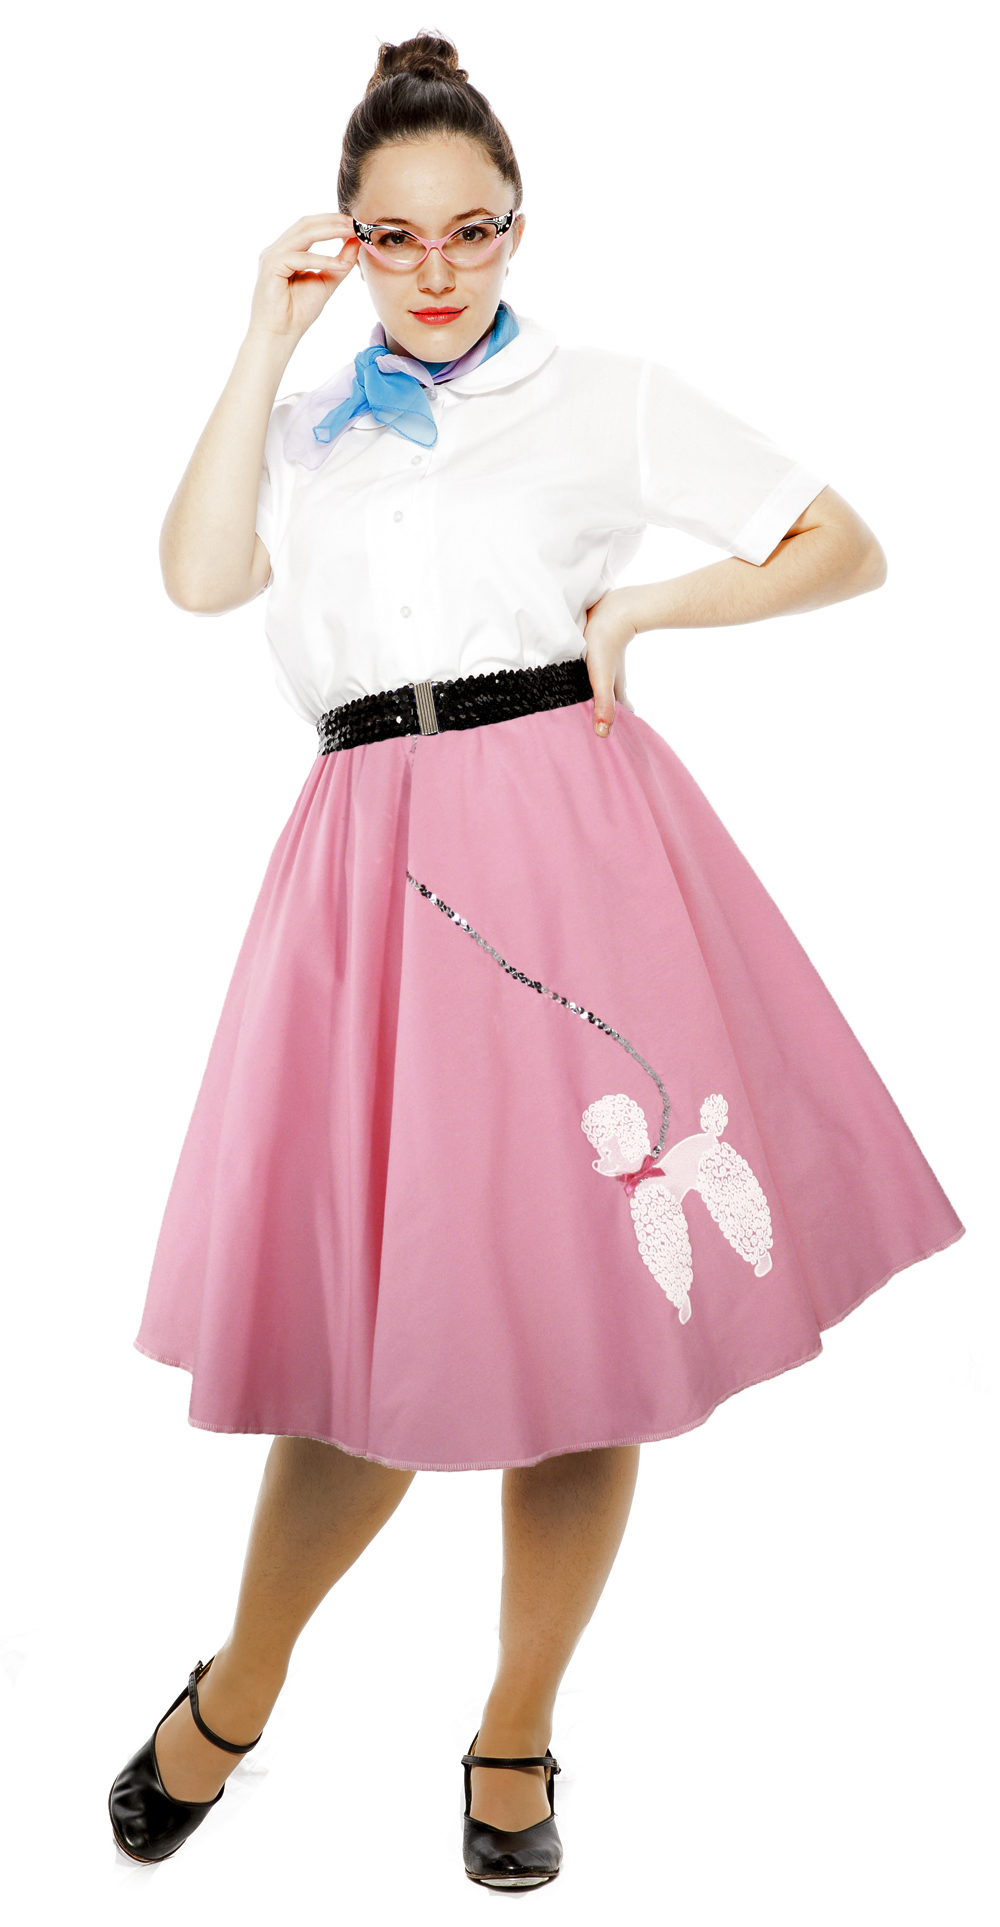 Sock hop dress images